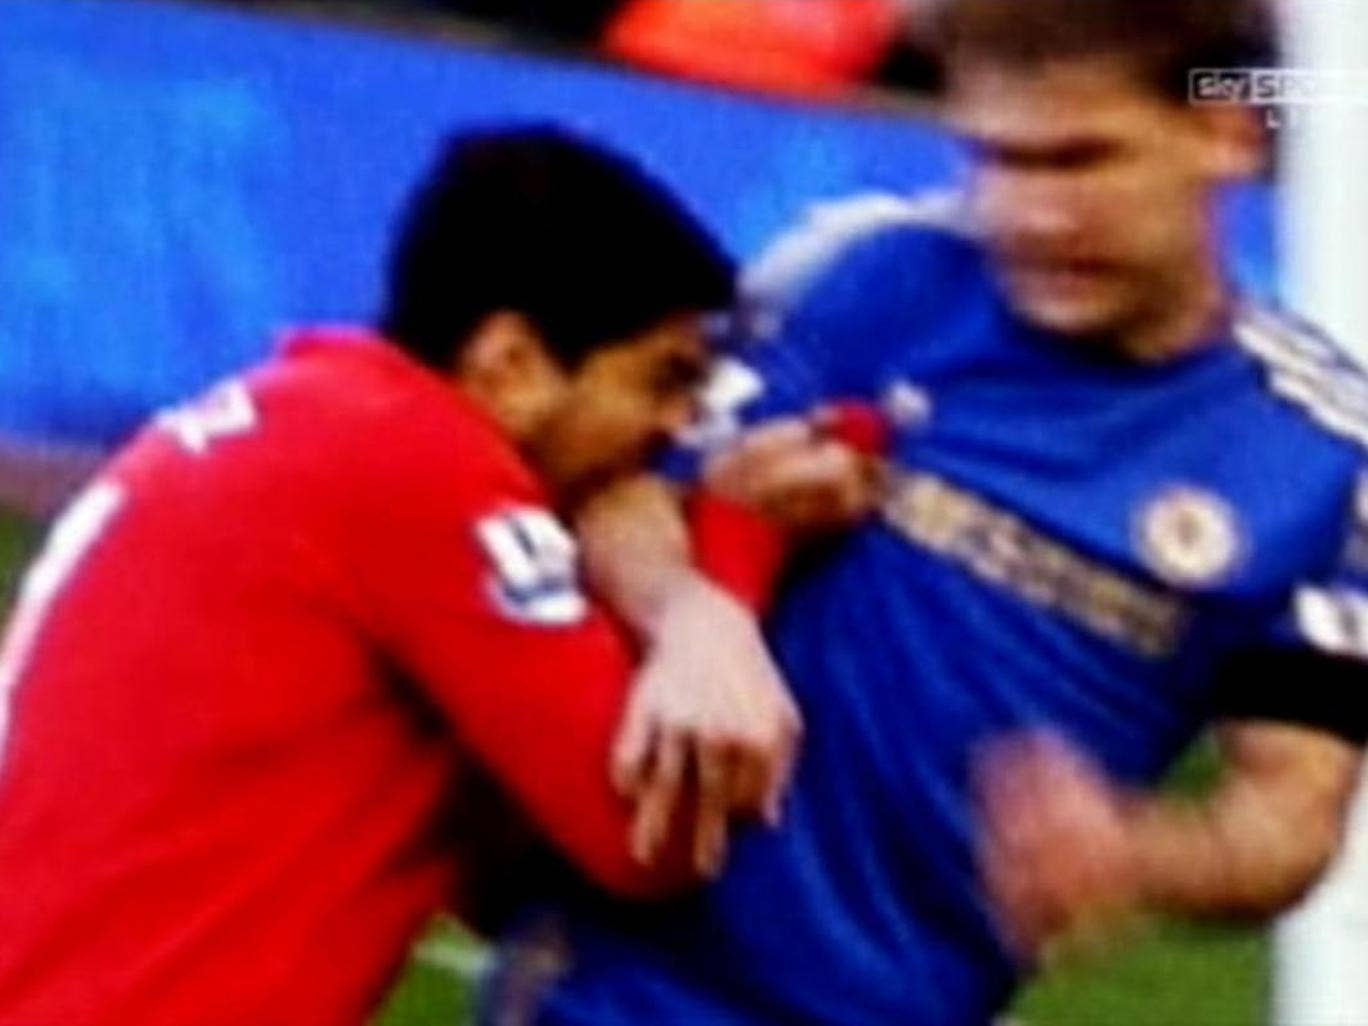 A screen grab of Luis Suarez biting Chelsea defender Branislav Ivanovic